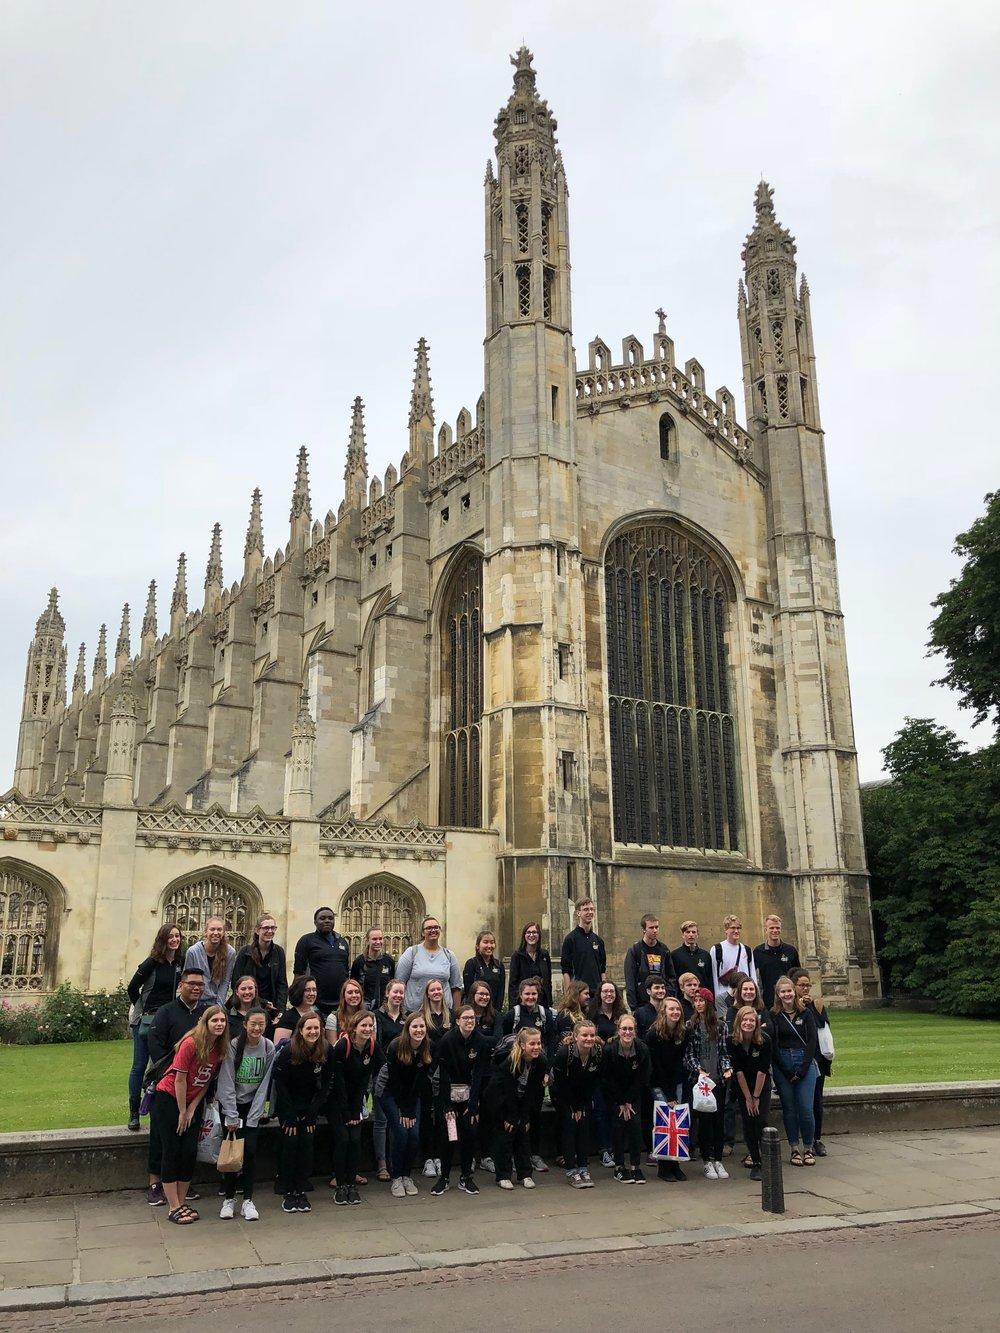 Iowa City West International Choir 2018, England and Ireland King's College Chapel, Cambridge